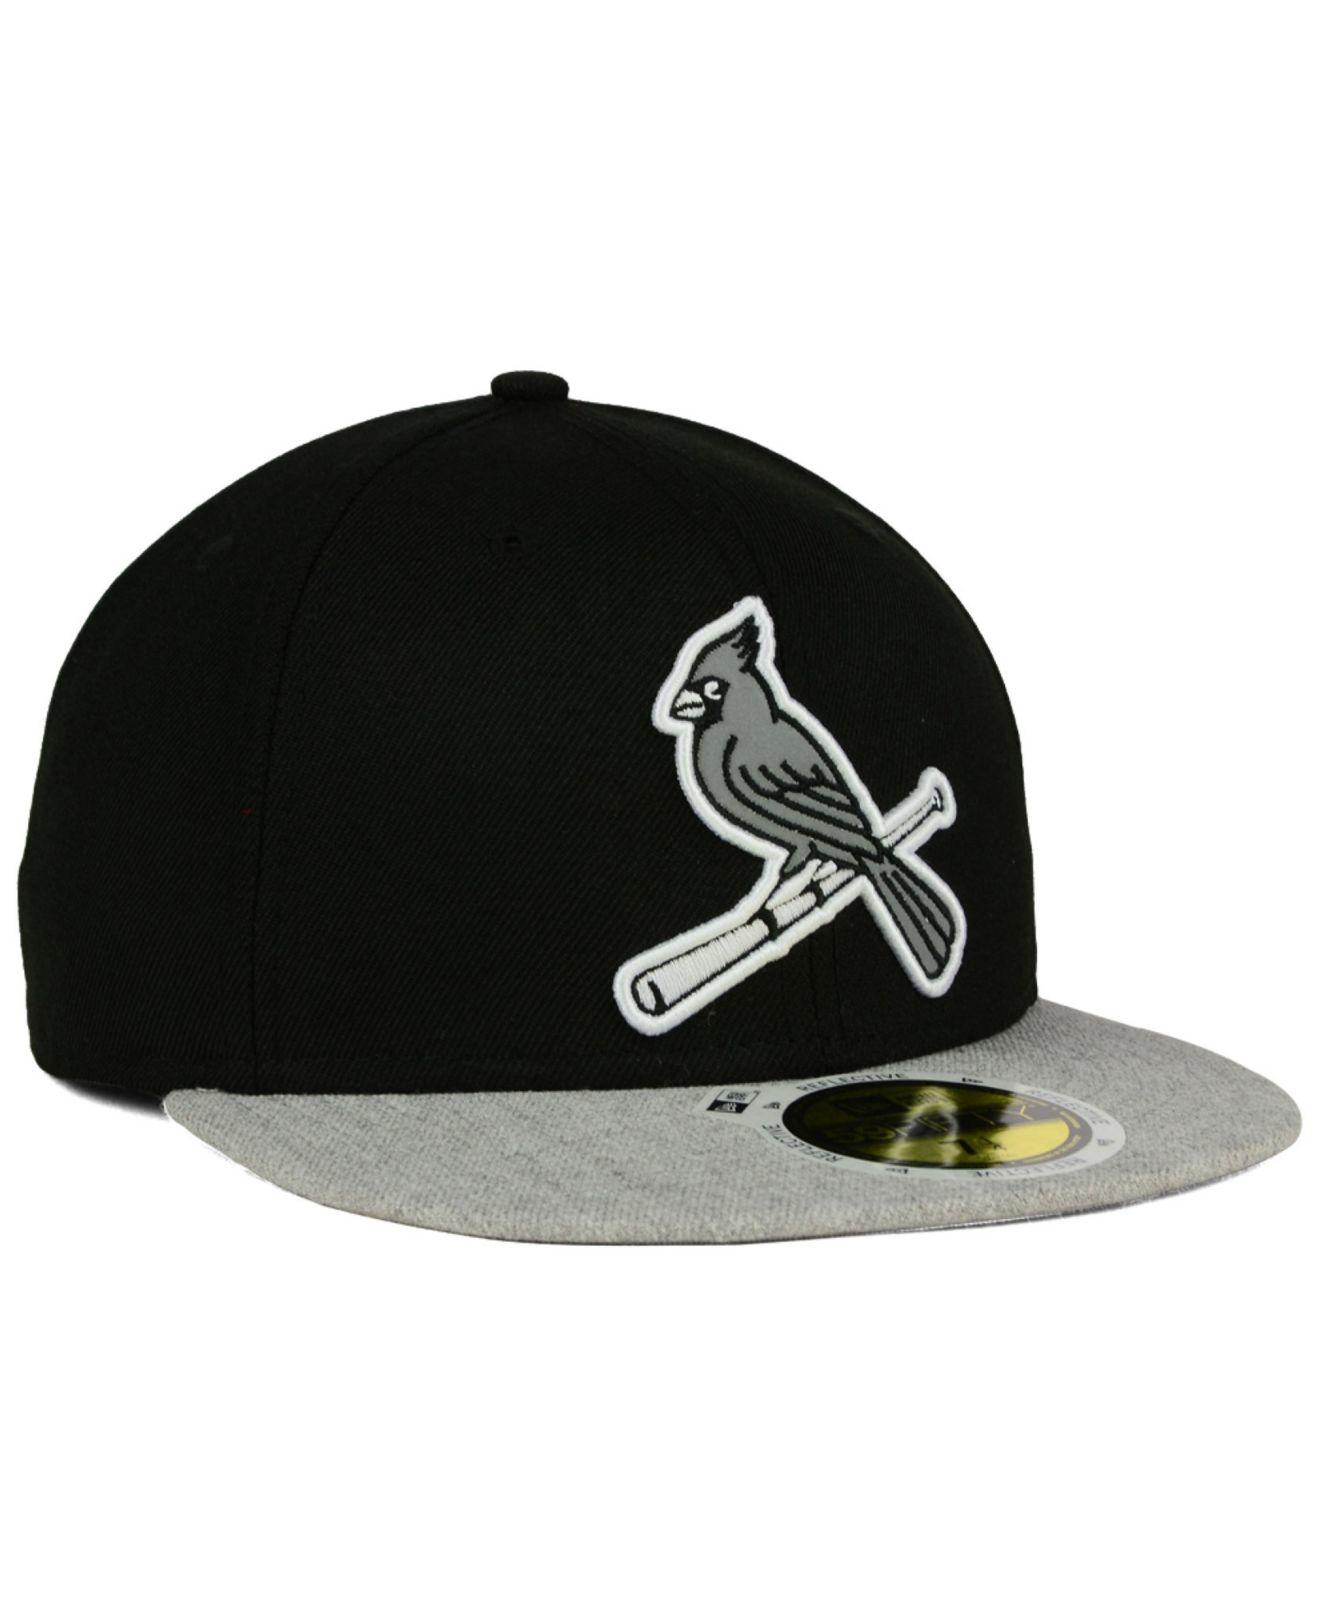 pretty nice bb252 7cb06 ... shop lyst ktz st. louis cardinals night reflective 59fifty cap in black  1a3e6 6f232